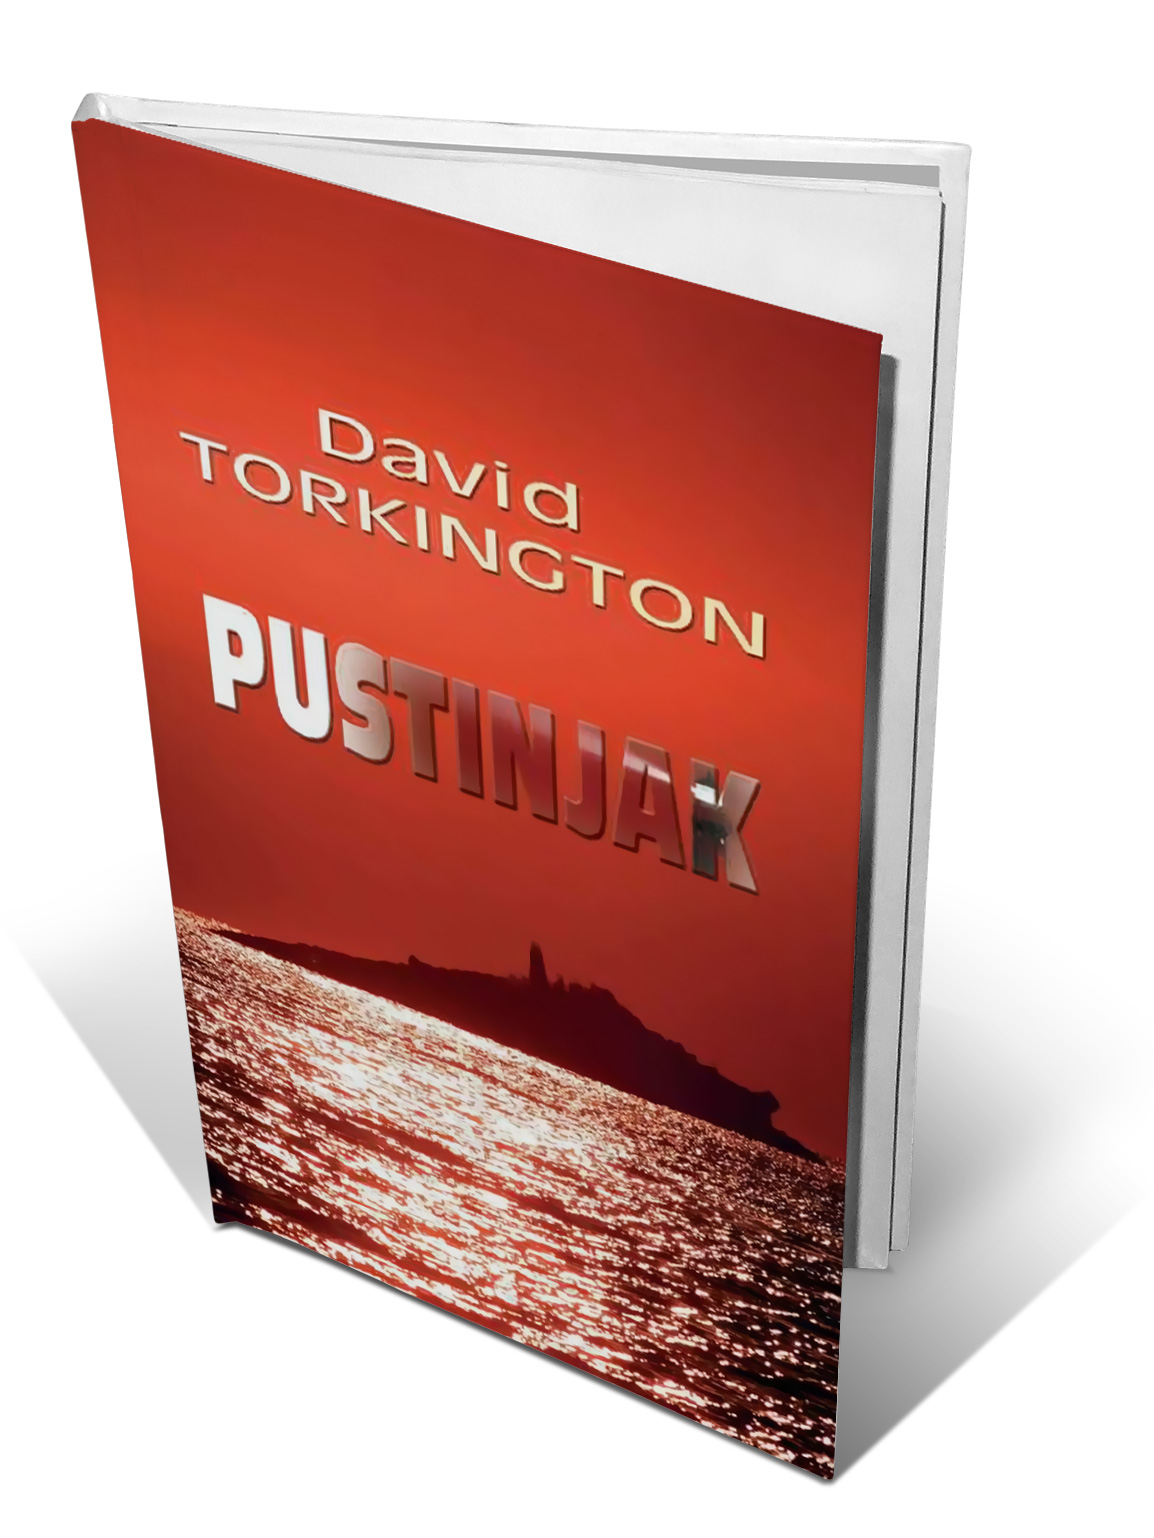 PUSTINJAK - David Torkington